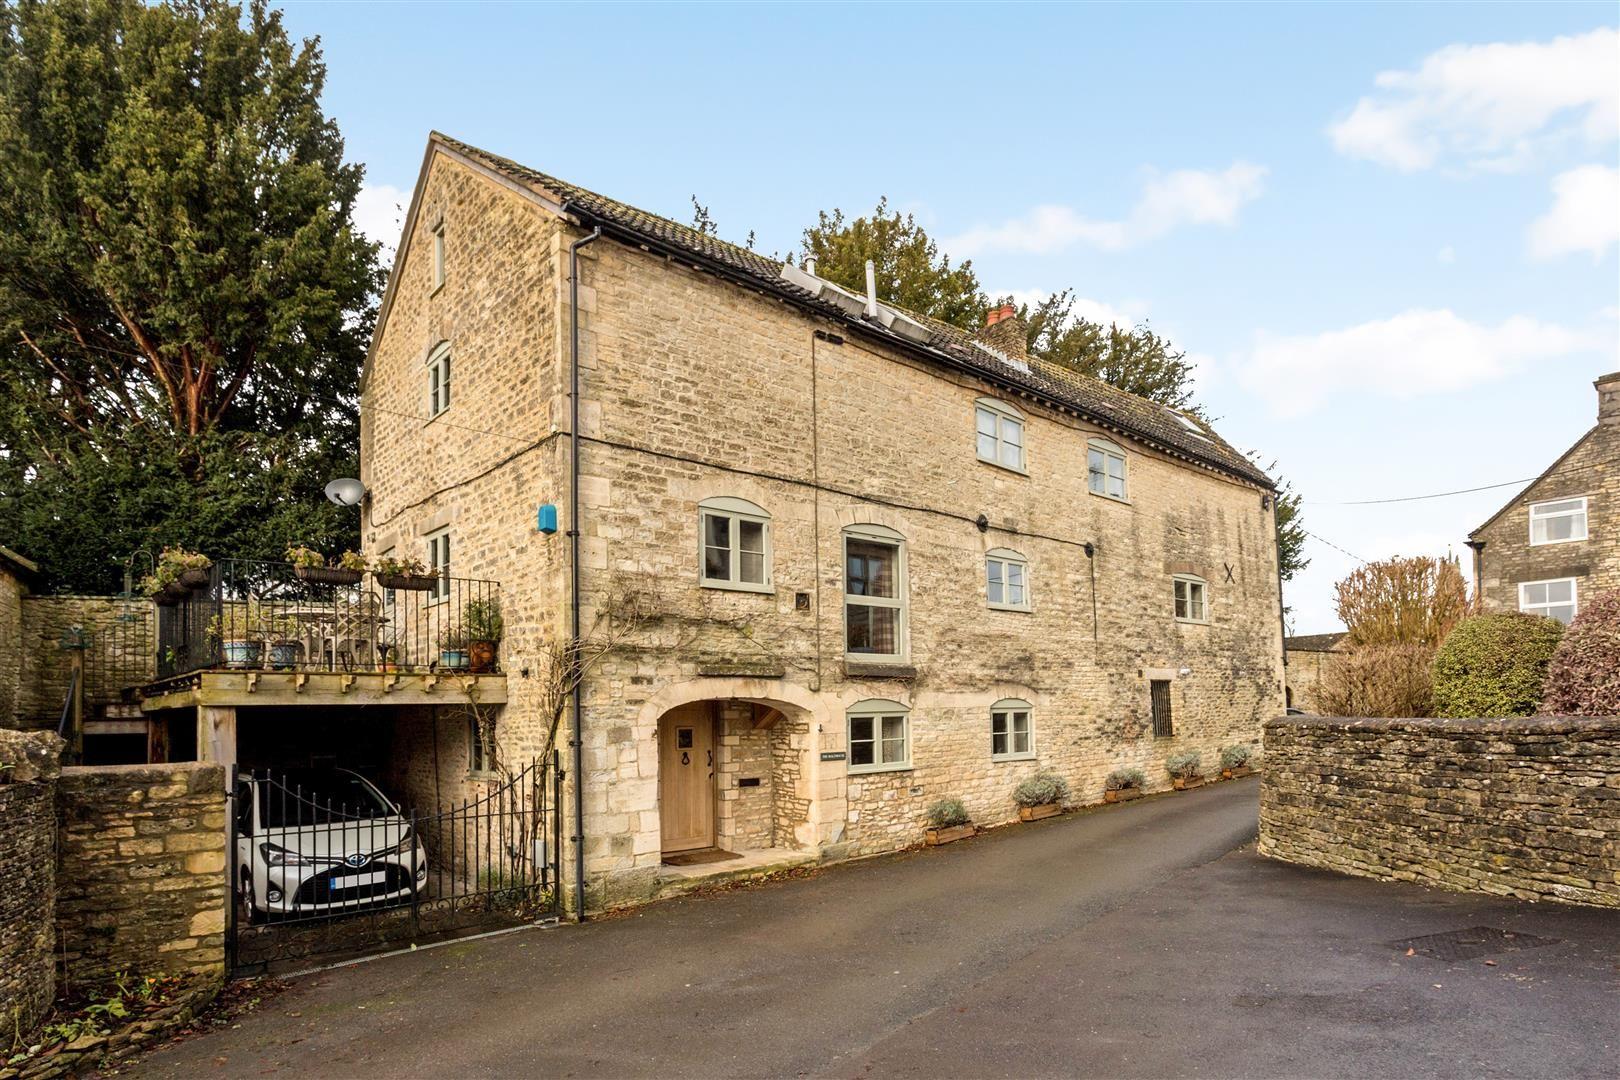 Property photo 1 of 21. The Malt House Fpz247025 (1).Jpg